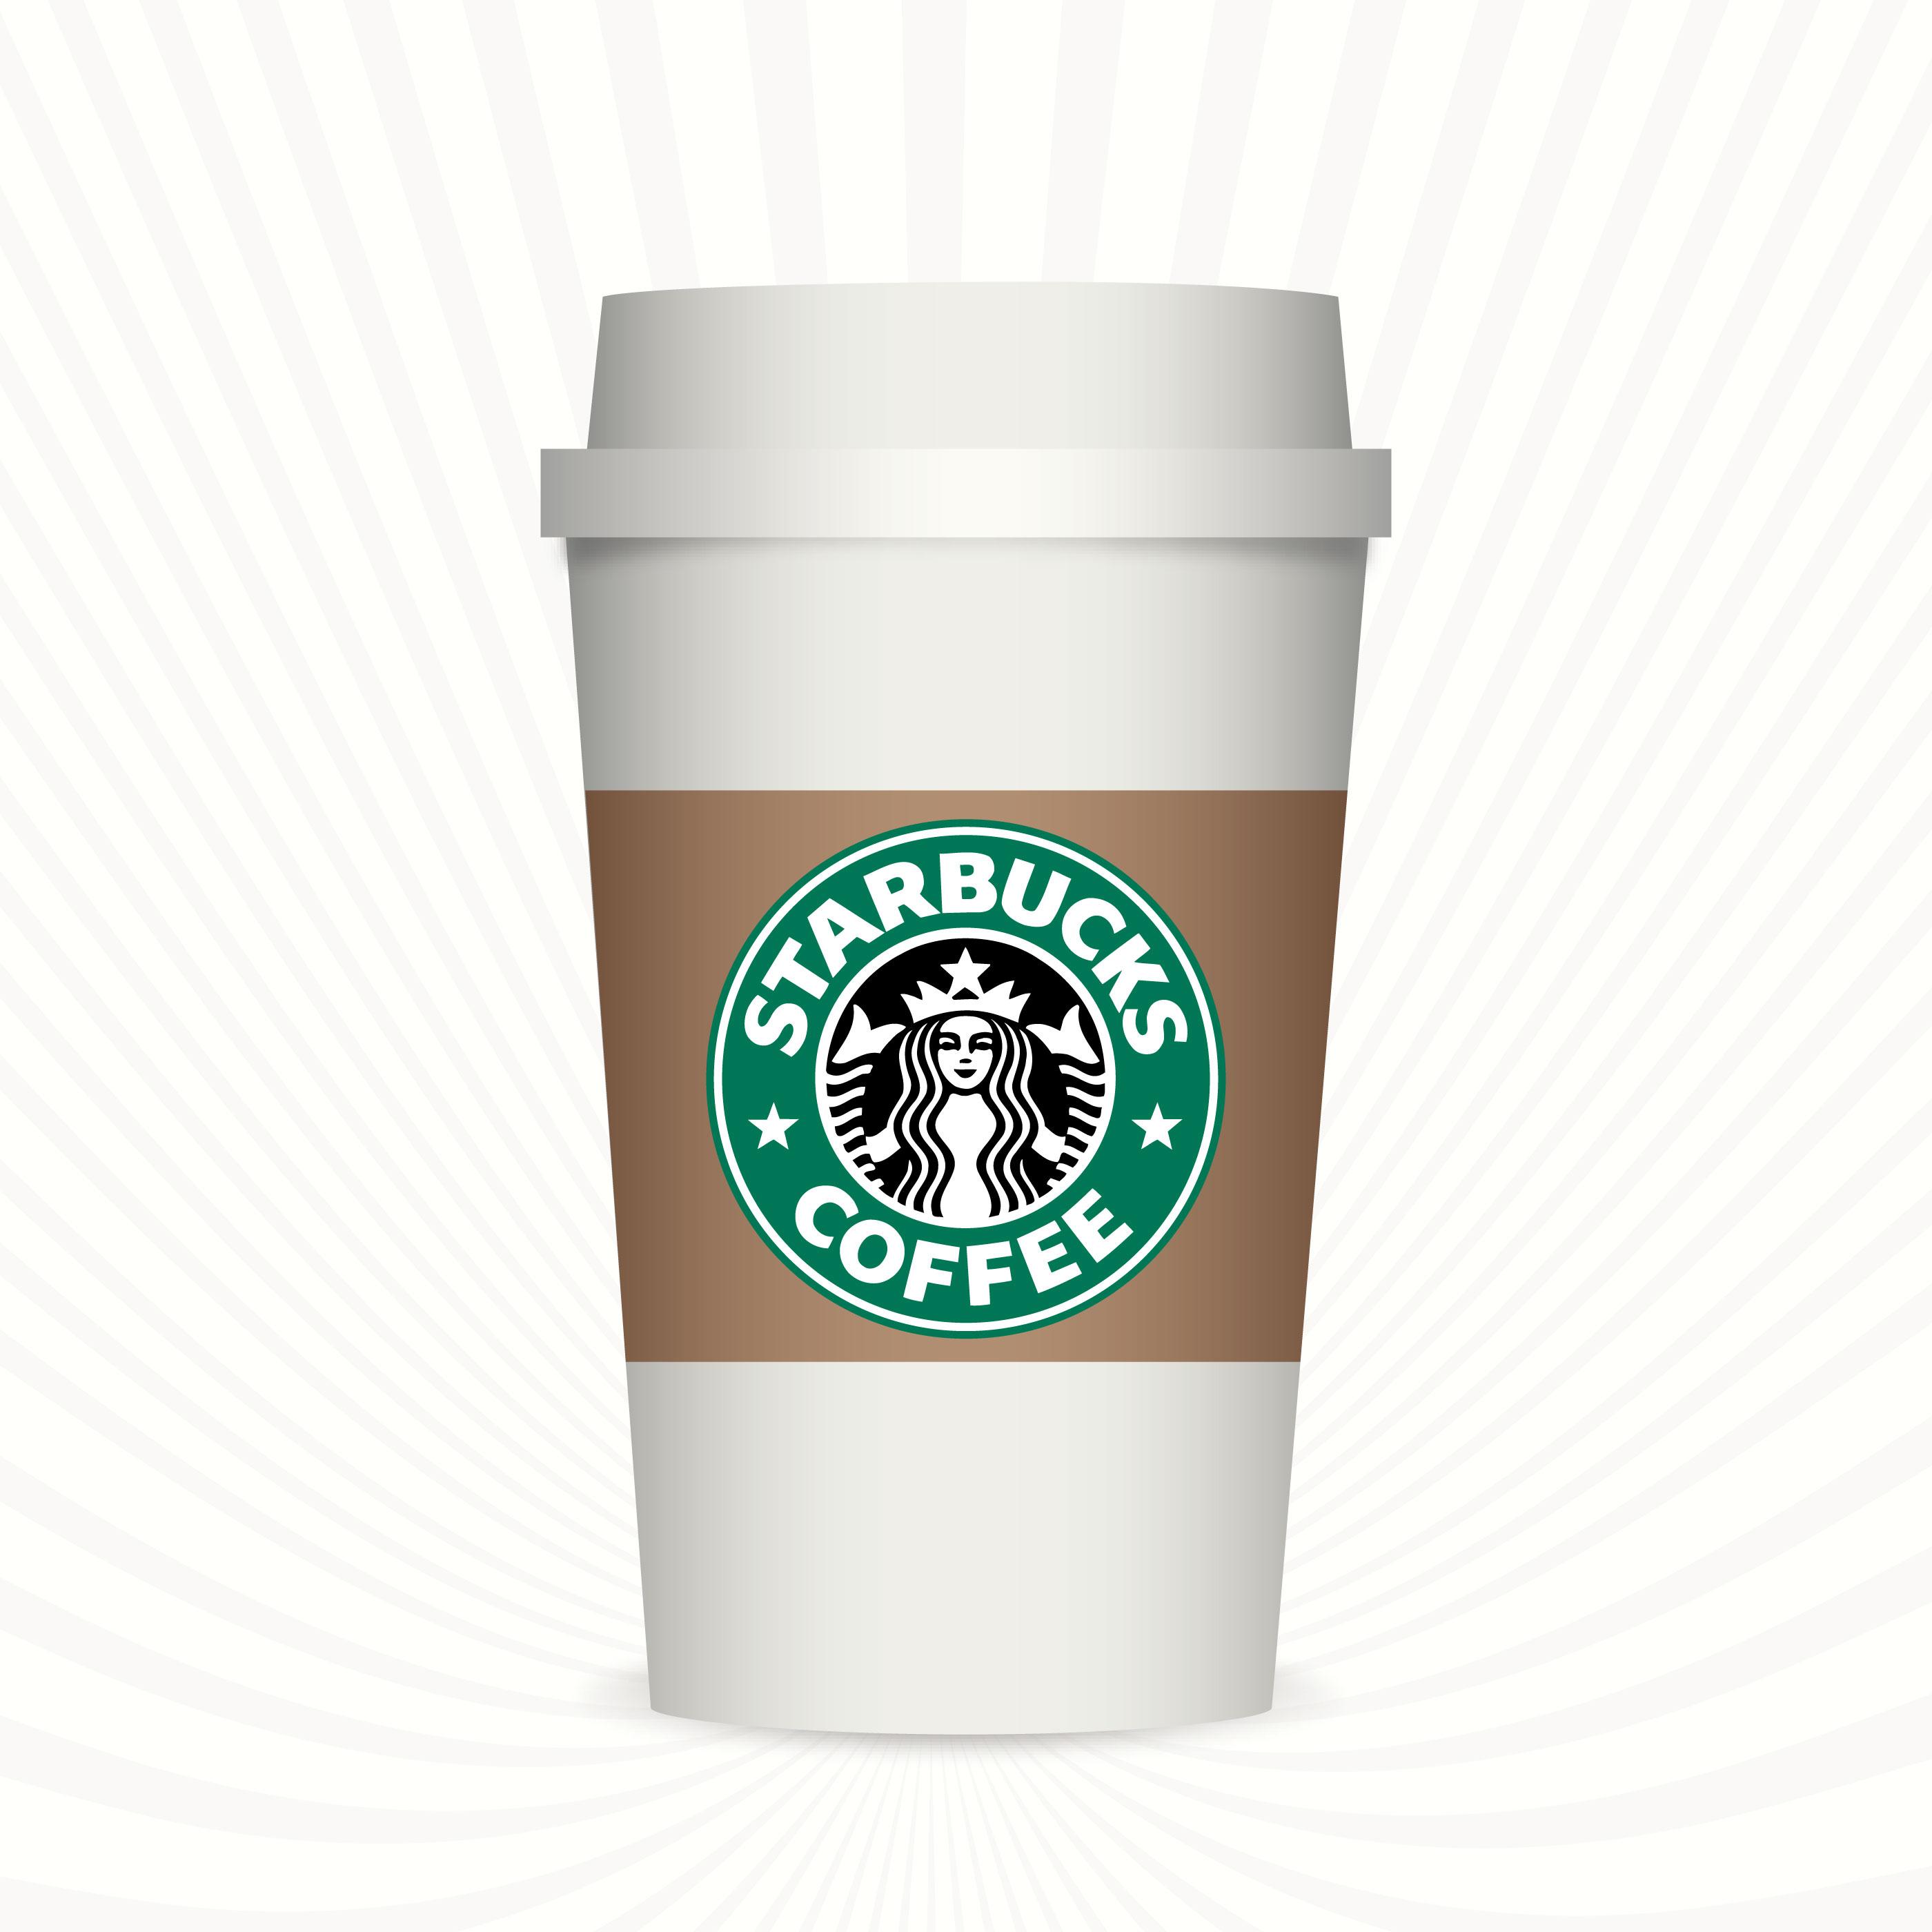 Coffe Starbucks Download Free Vector Art Stock Graphics